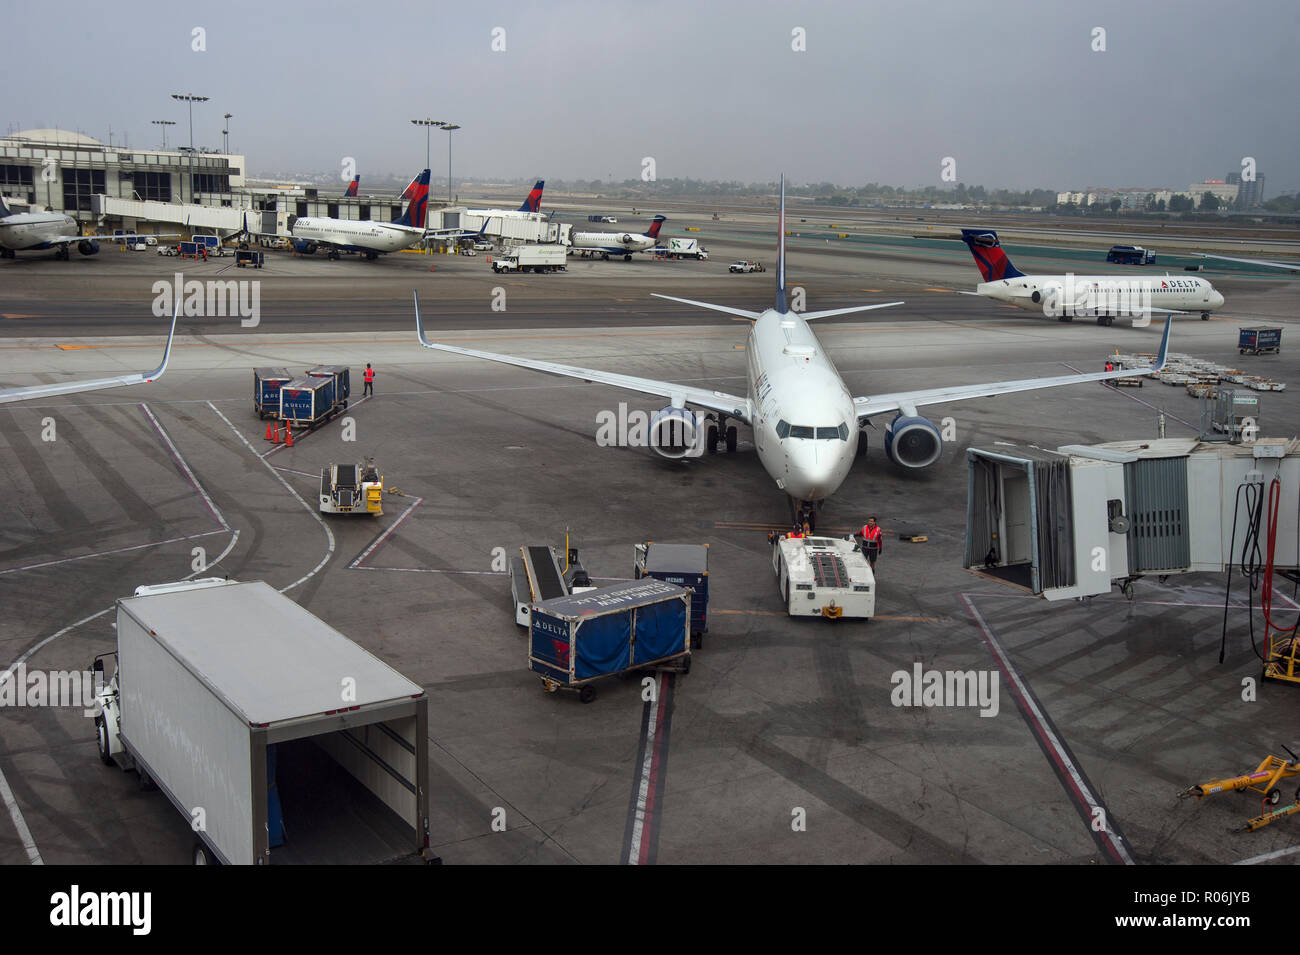 Missoula International Airport in Montana, USA - Stock Image